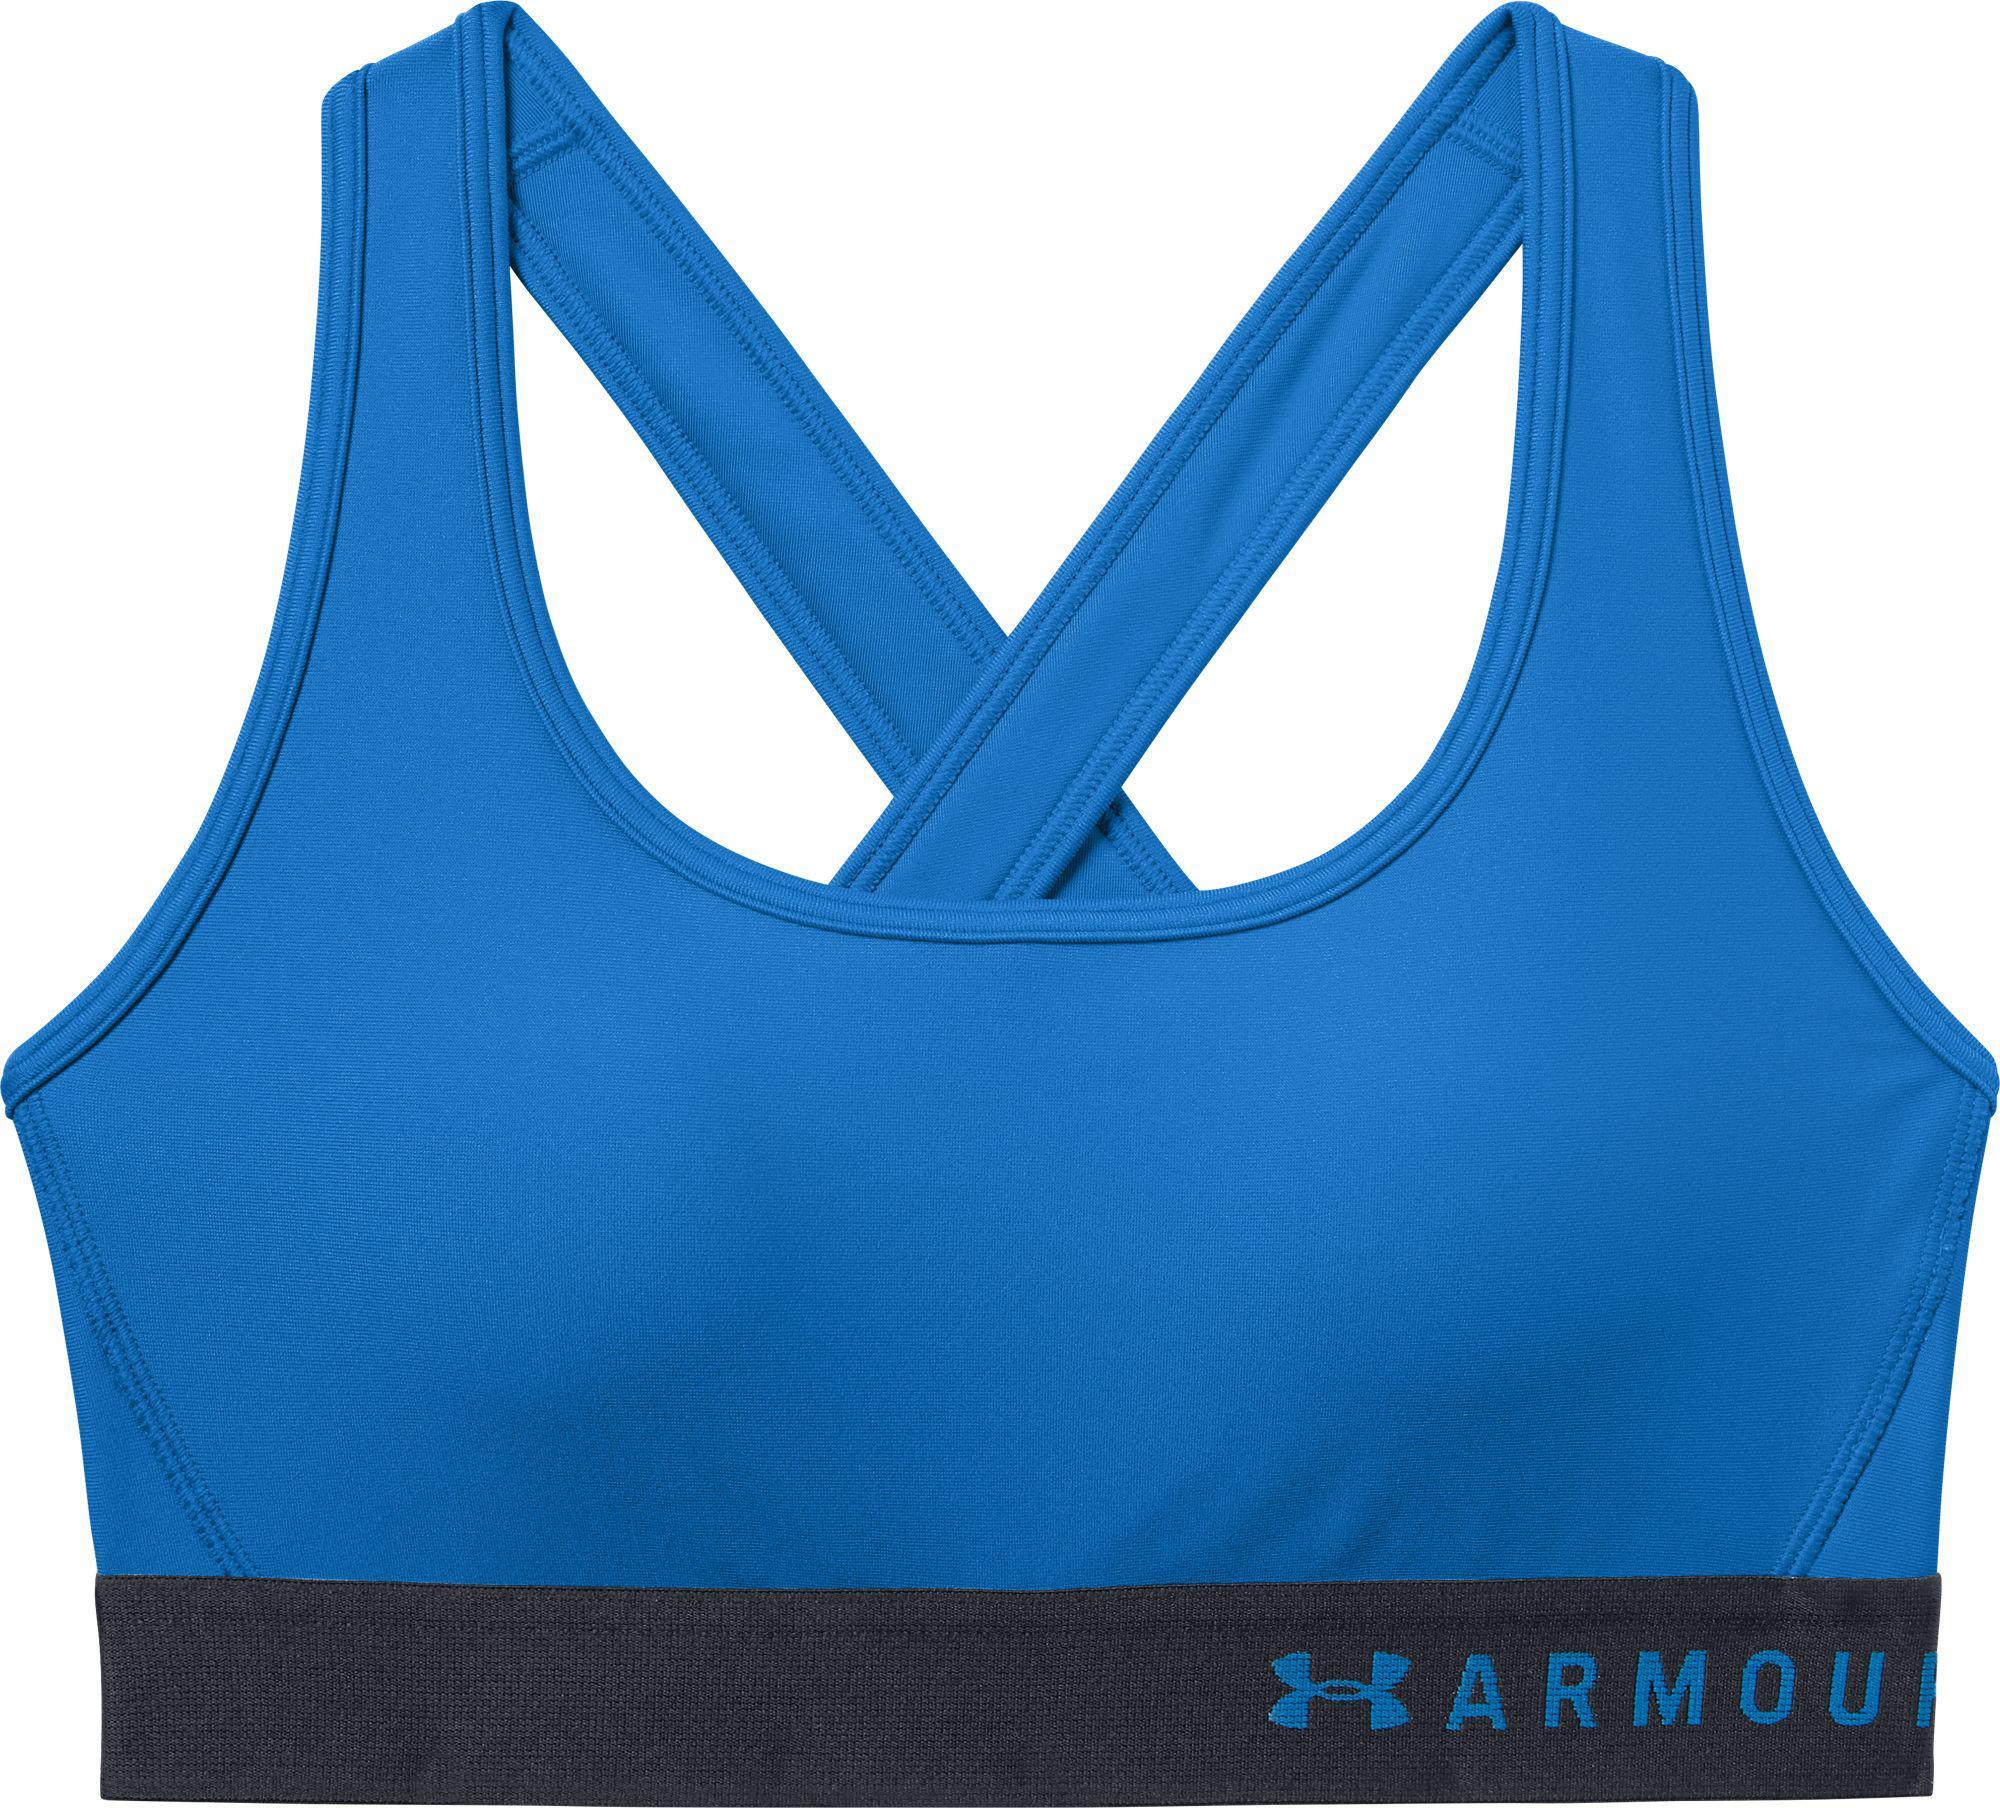 46766aeea4 Lyst - Under Armour Armour Medium Impact Crossback Sports Bra in Blue